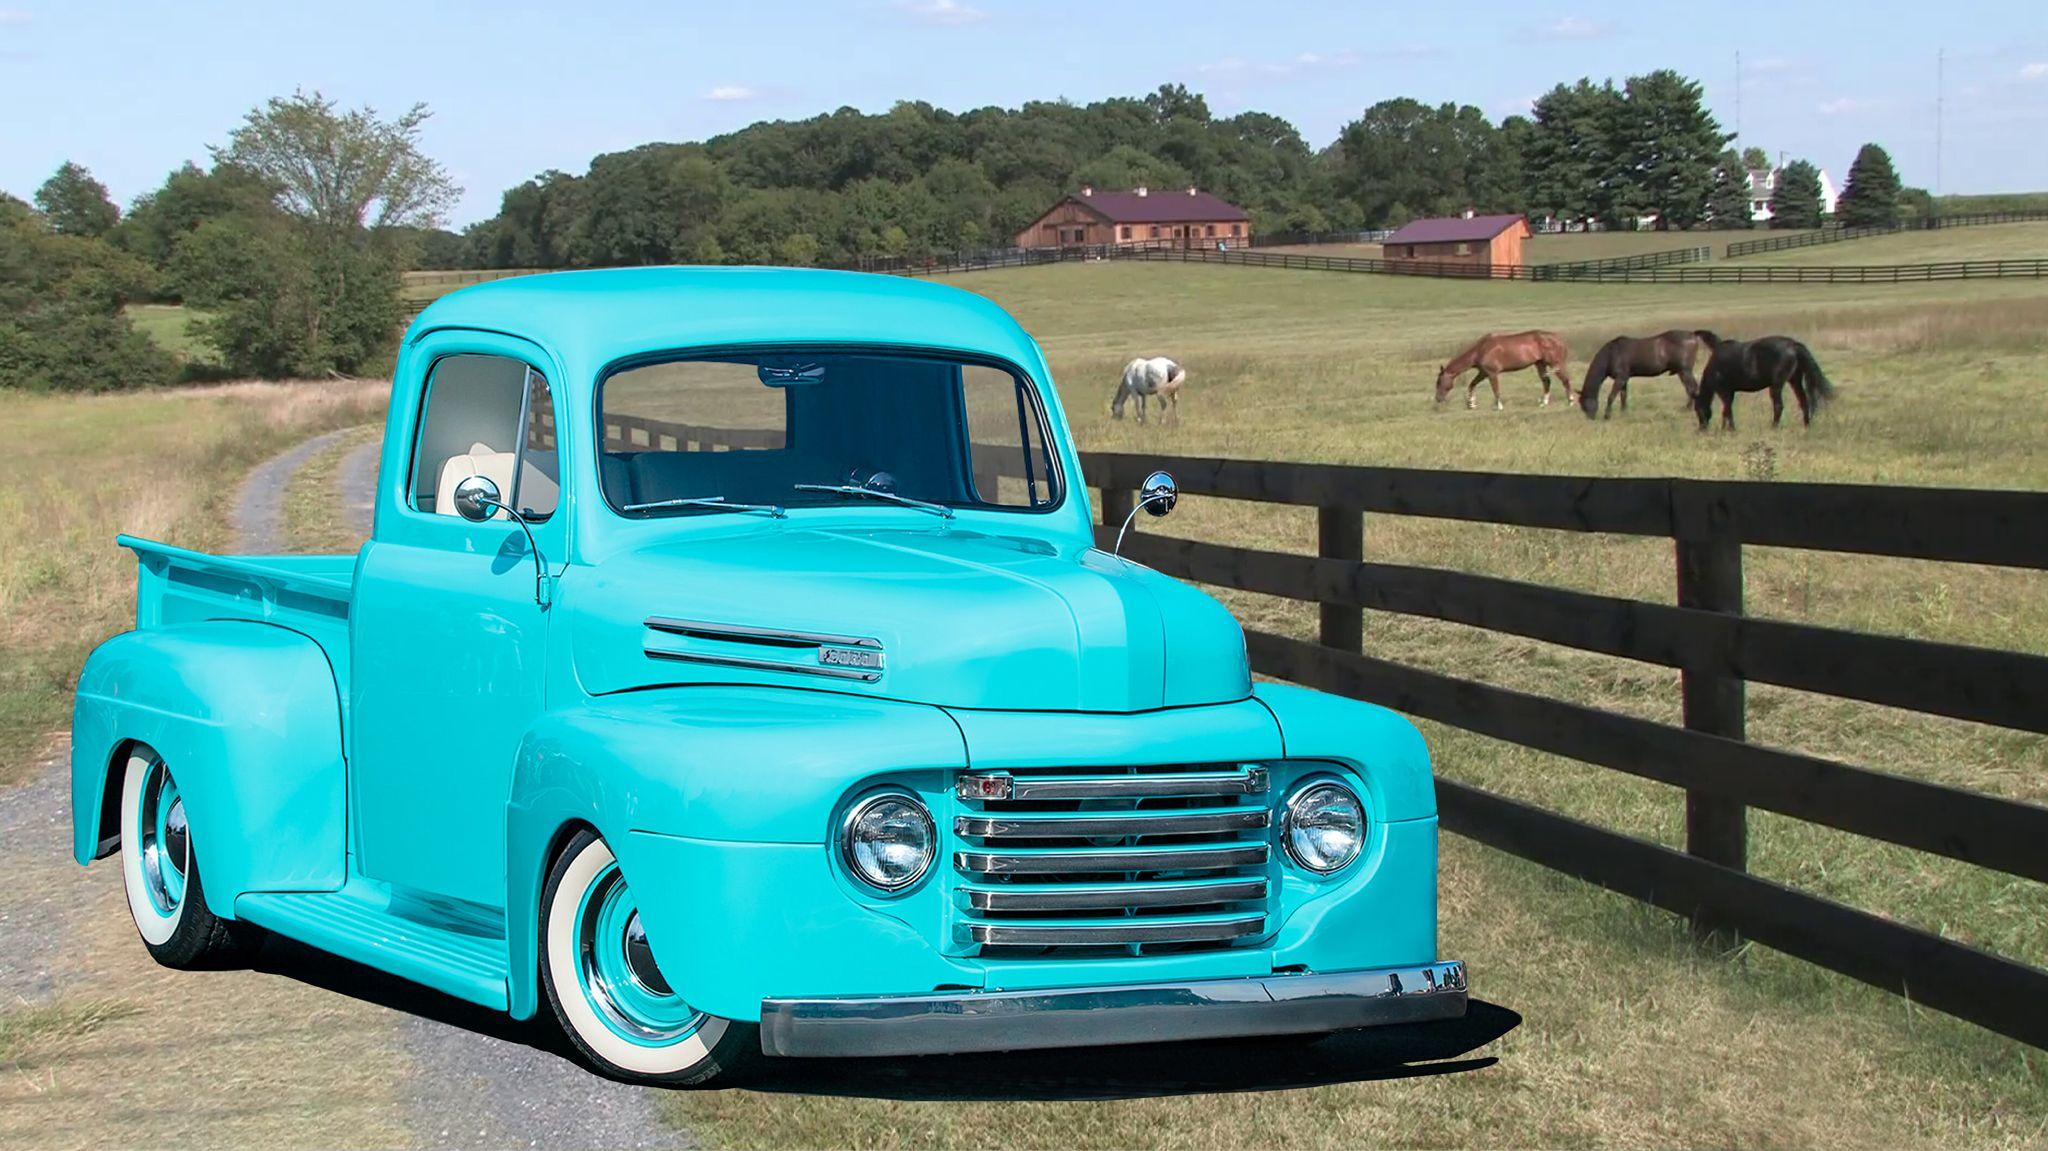 1950 Ford Pickup Lt Blue High Definition Wallpaper 1950 Ford Pickup Ford Pickup 1950 Ford Truck